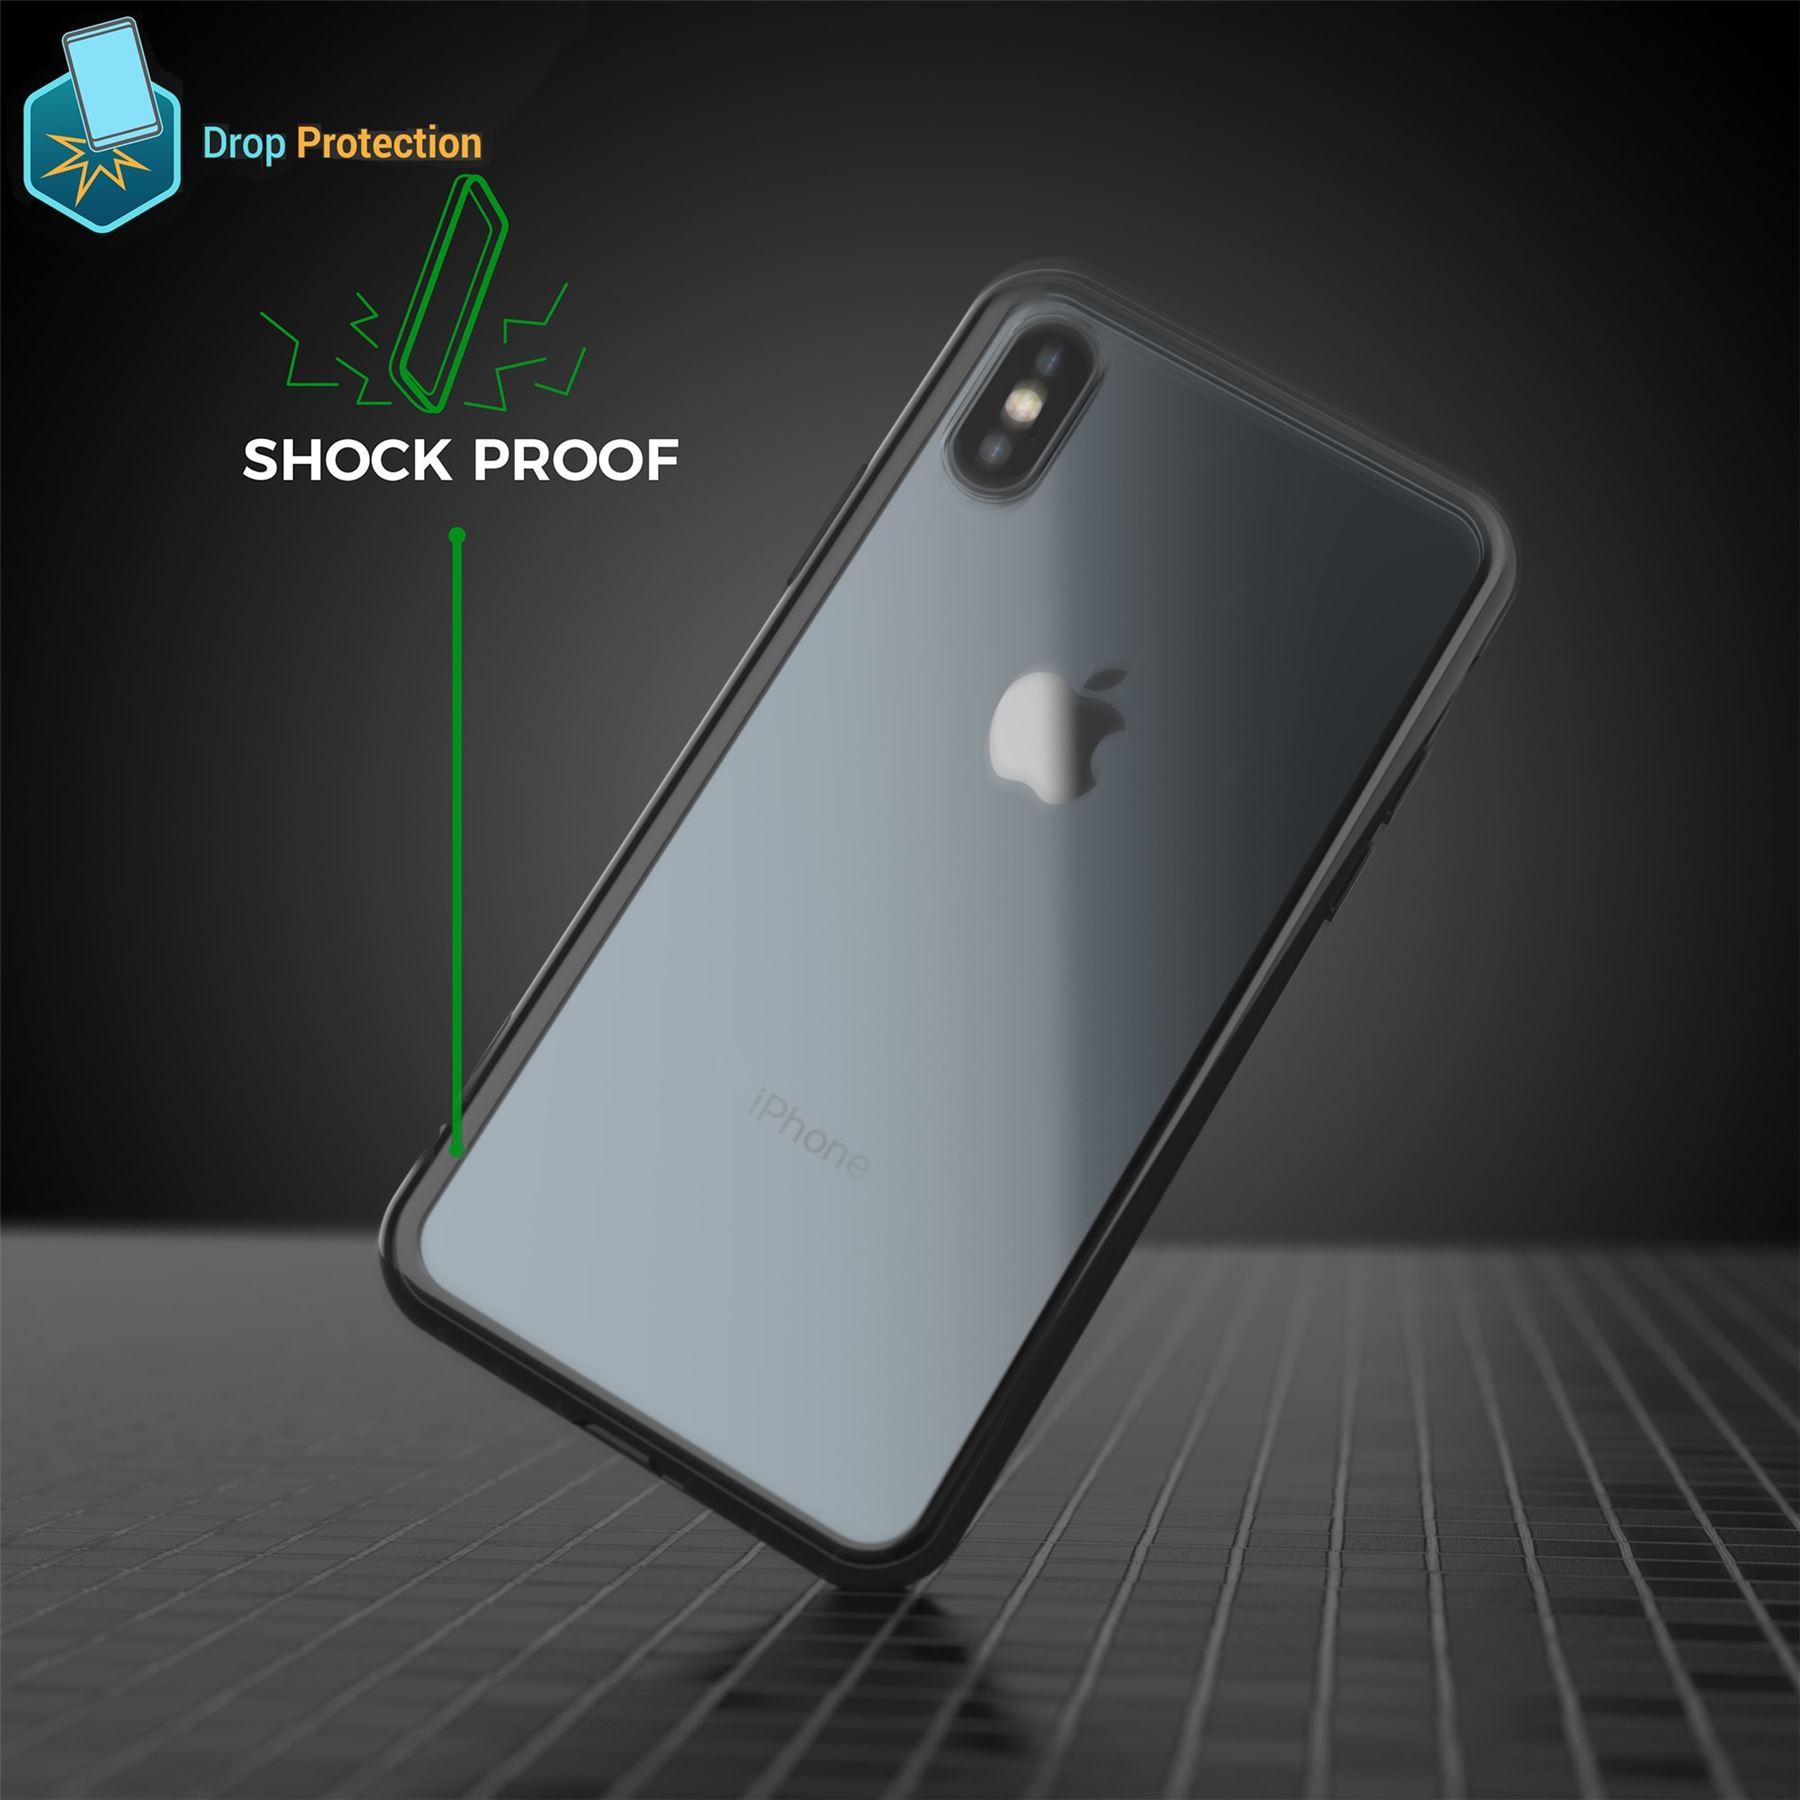 thumbnail 11 - For Apple iPhone XR Xs Max X 8 7 Plus 6 5 Se Case Cover Clear Transparent CS283